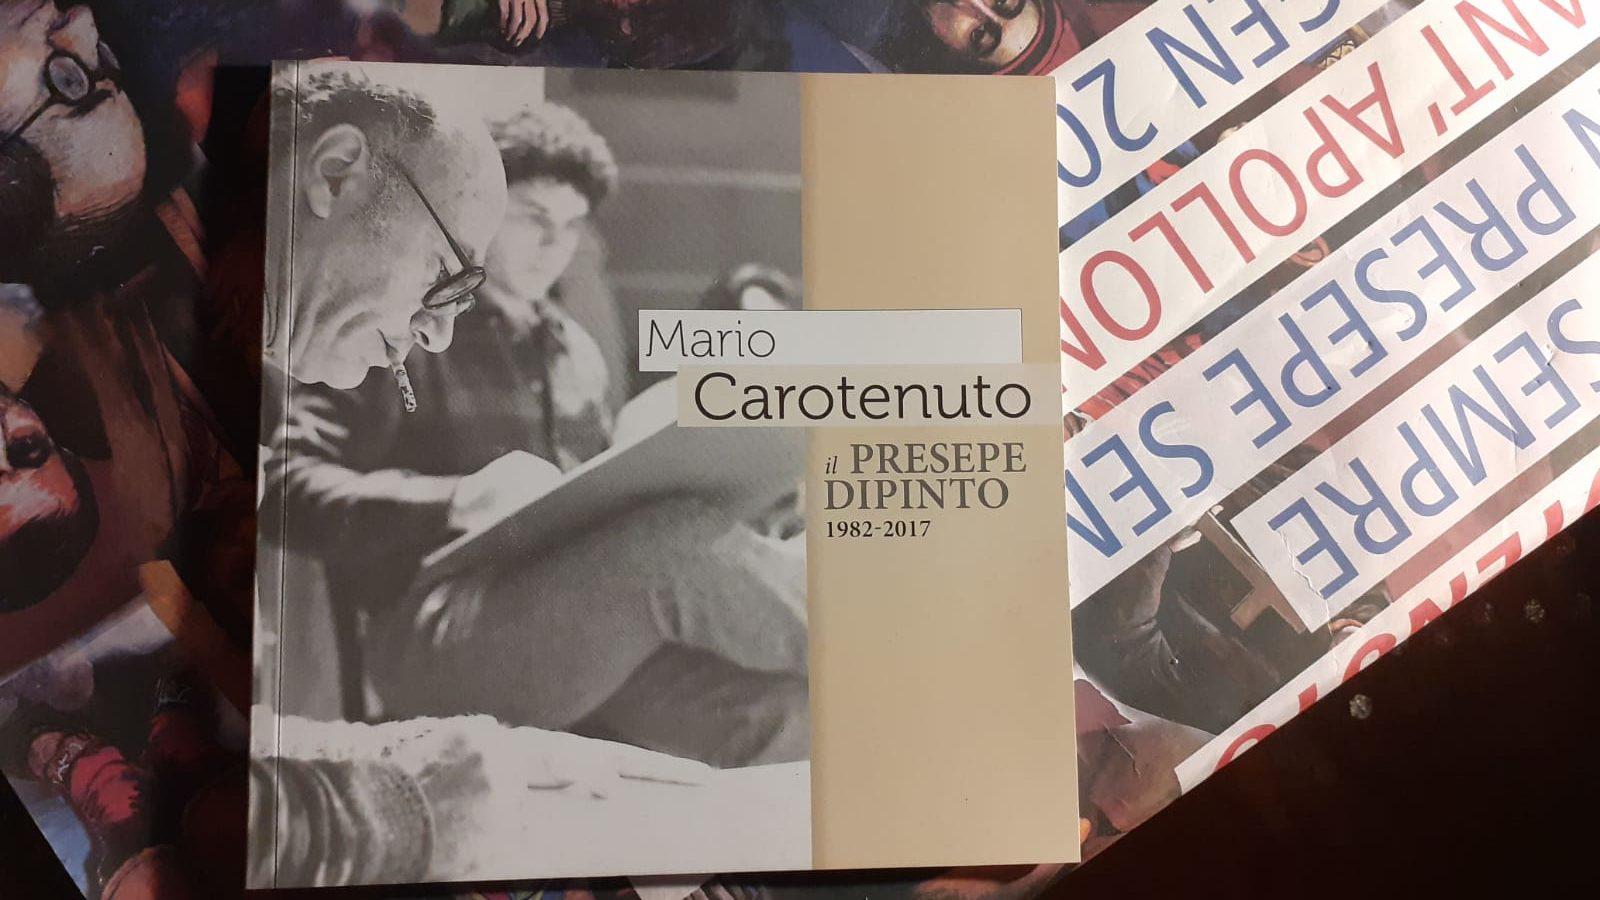 Mario Carotenuto Il Presepe Dipinto 1982-2017